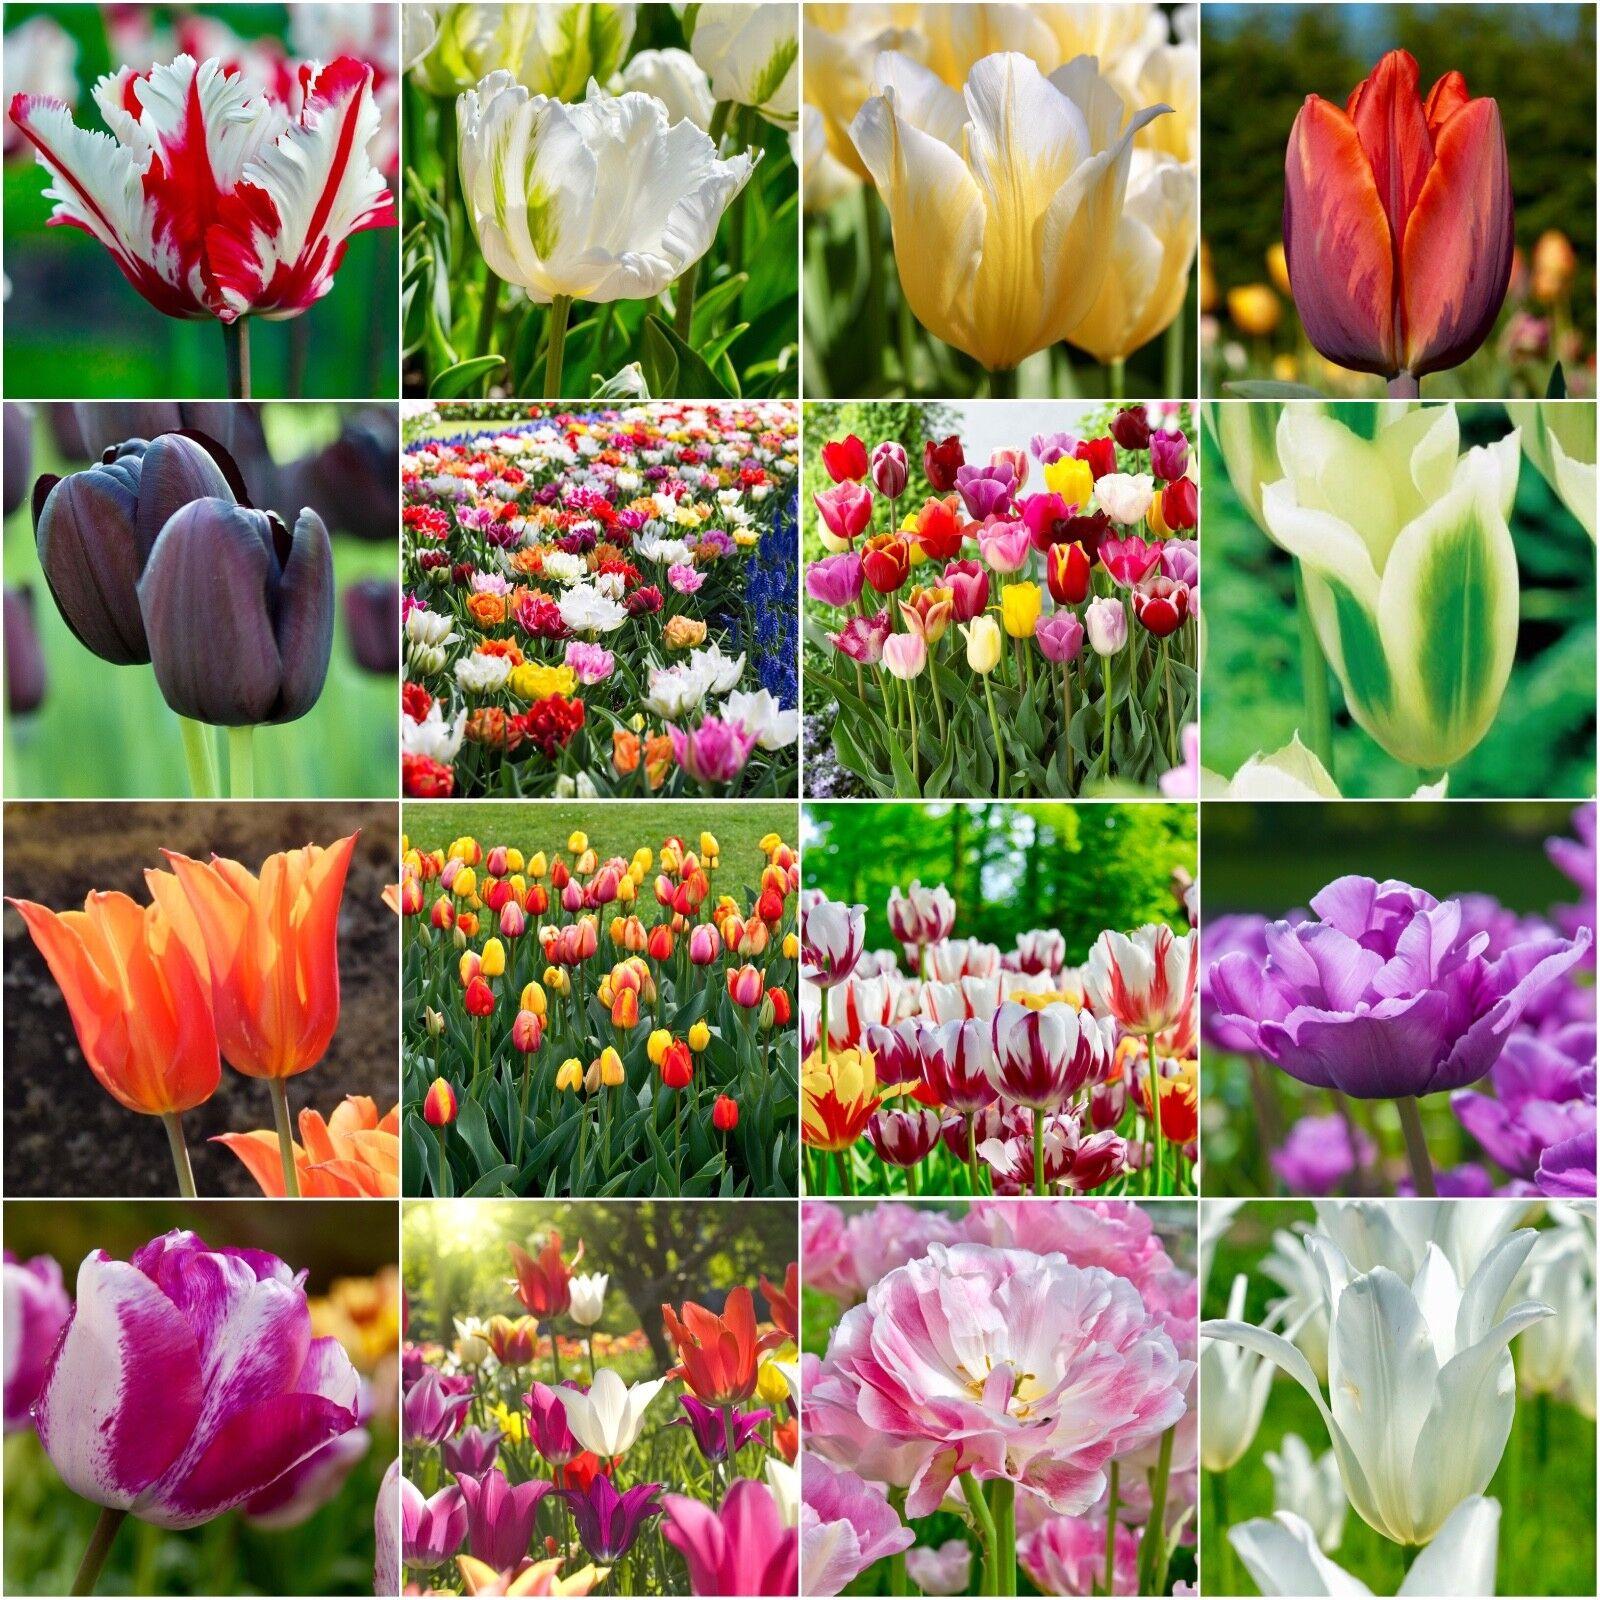 Details About Tulip Varieties Tulip Bulbs Border Spring Flowering Bulbs Plants Perennials